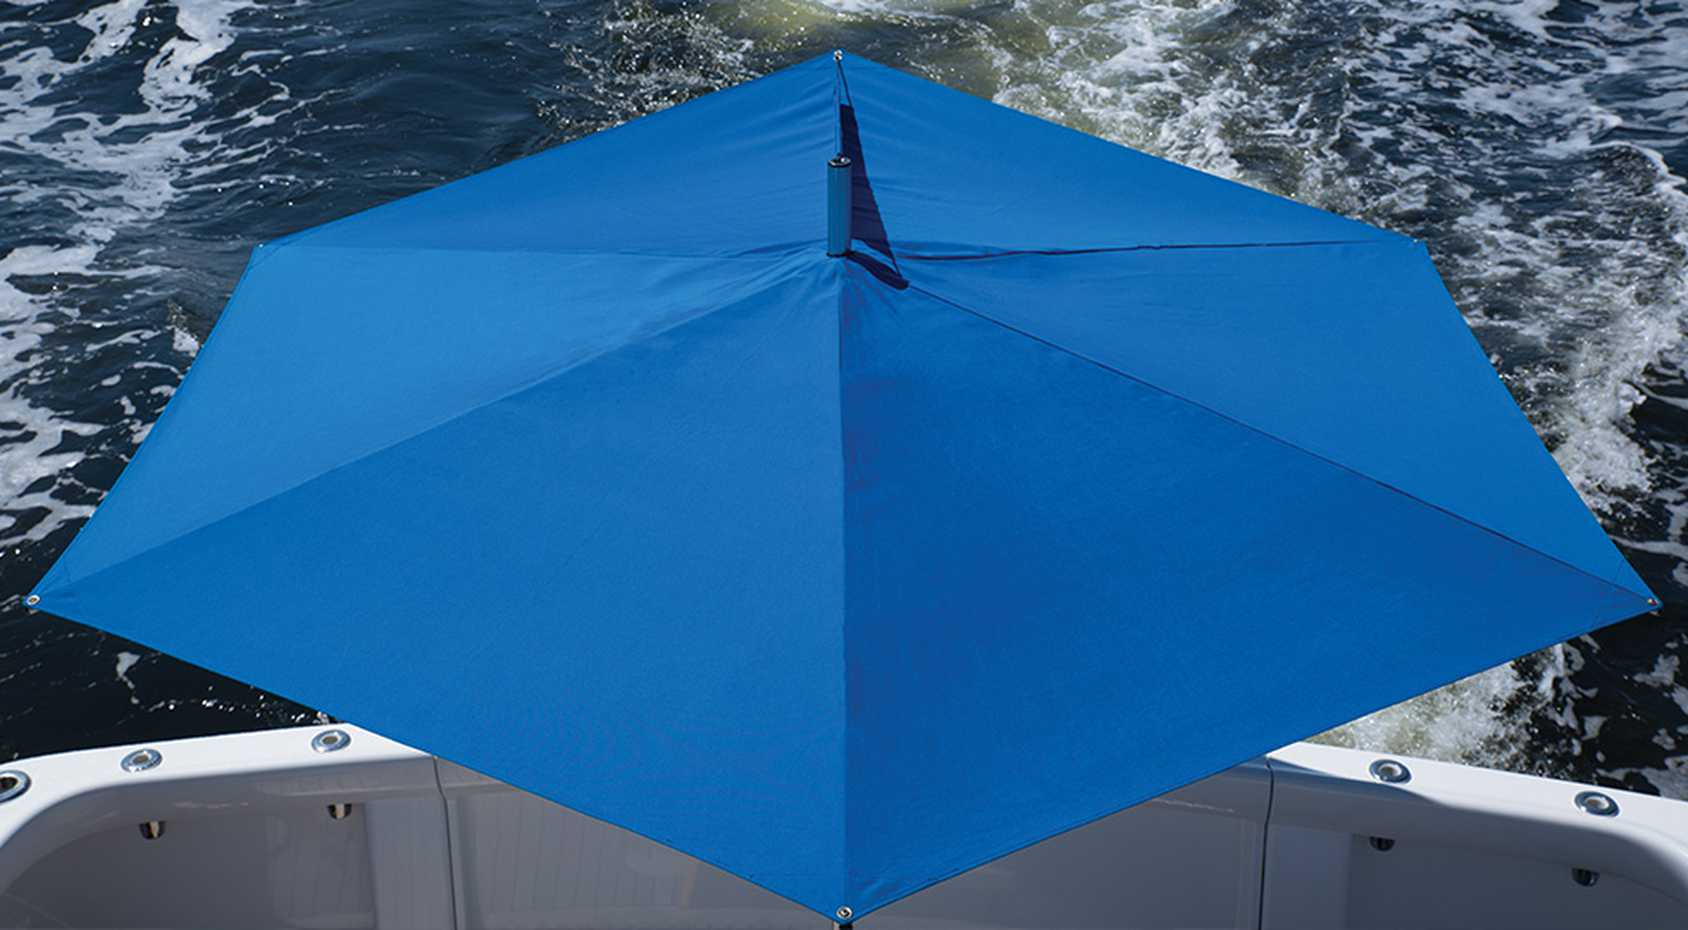 Finbrella by Finbrella product image 4